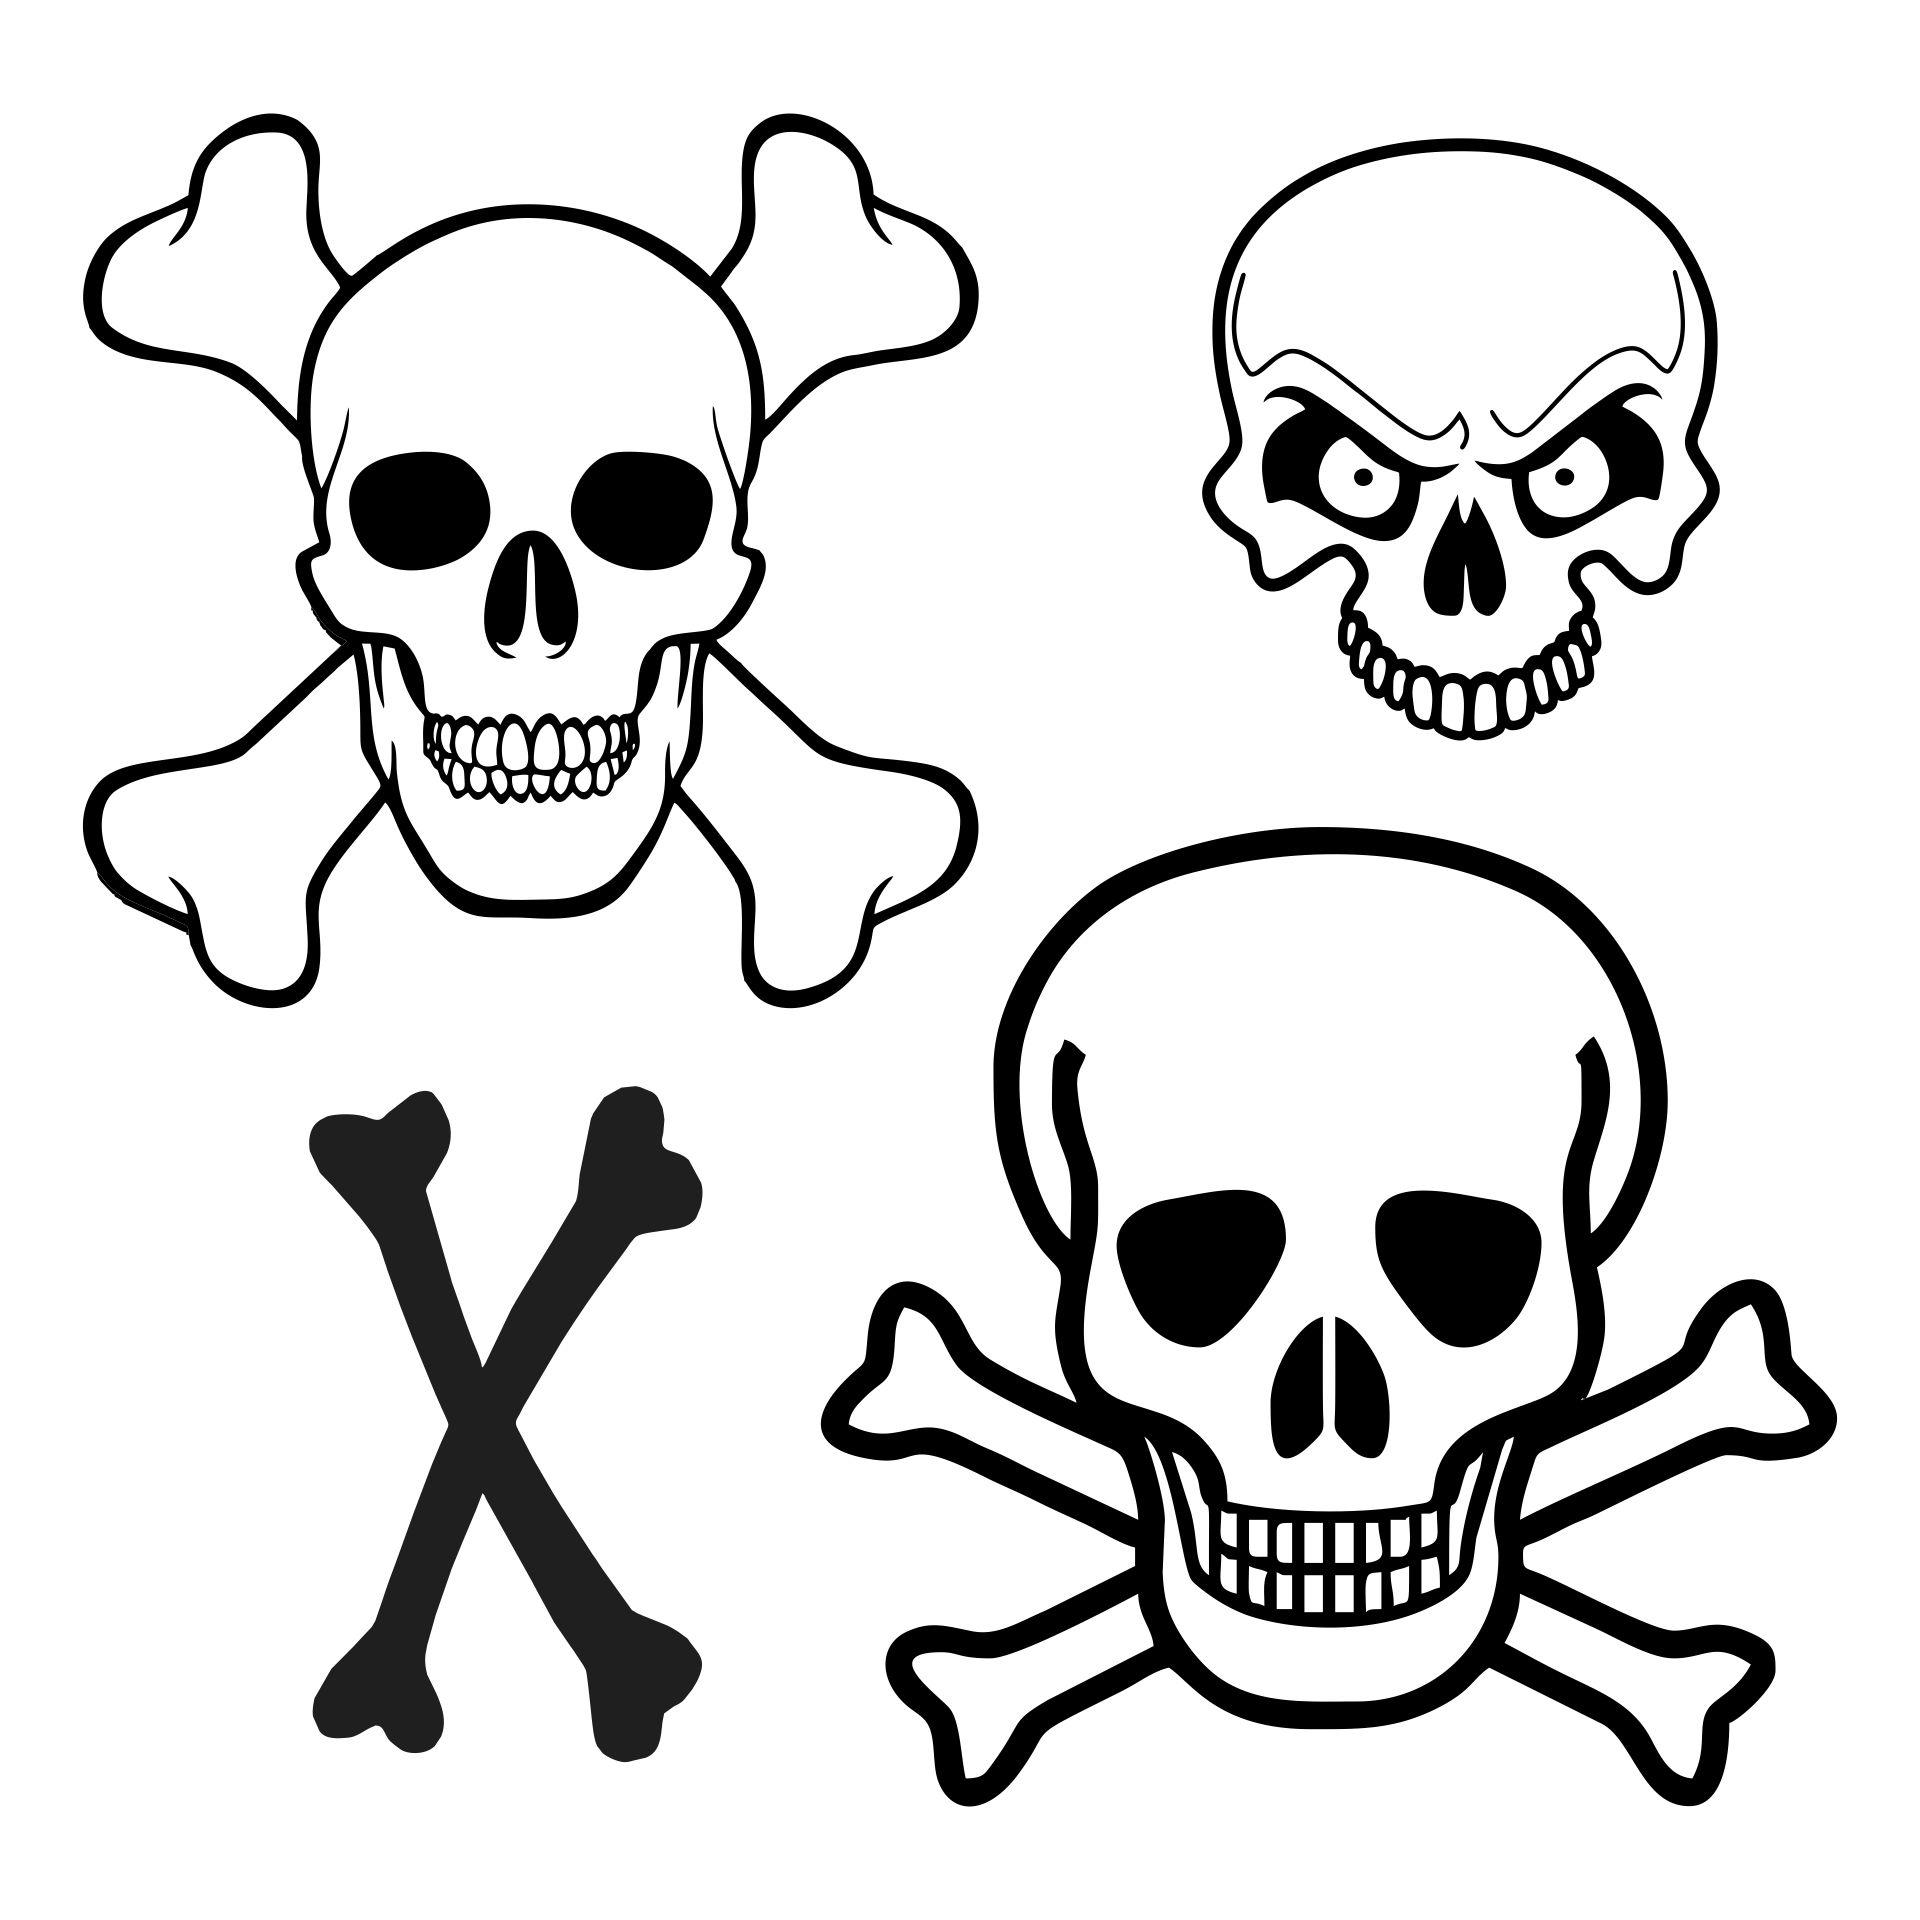 Printable Skull and Crossbones